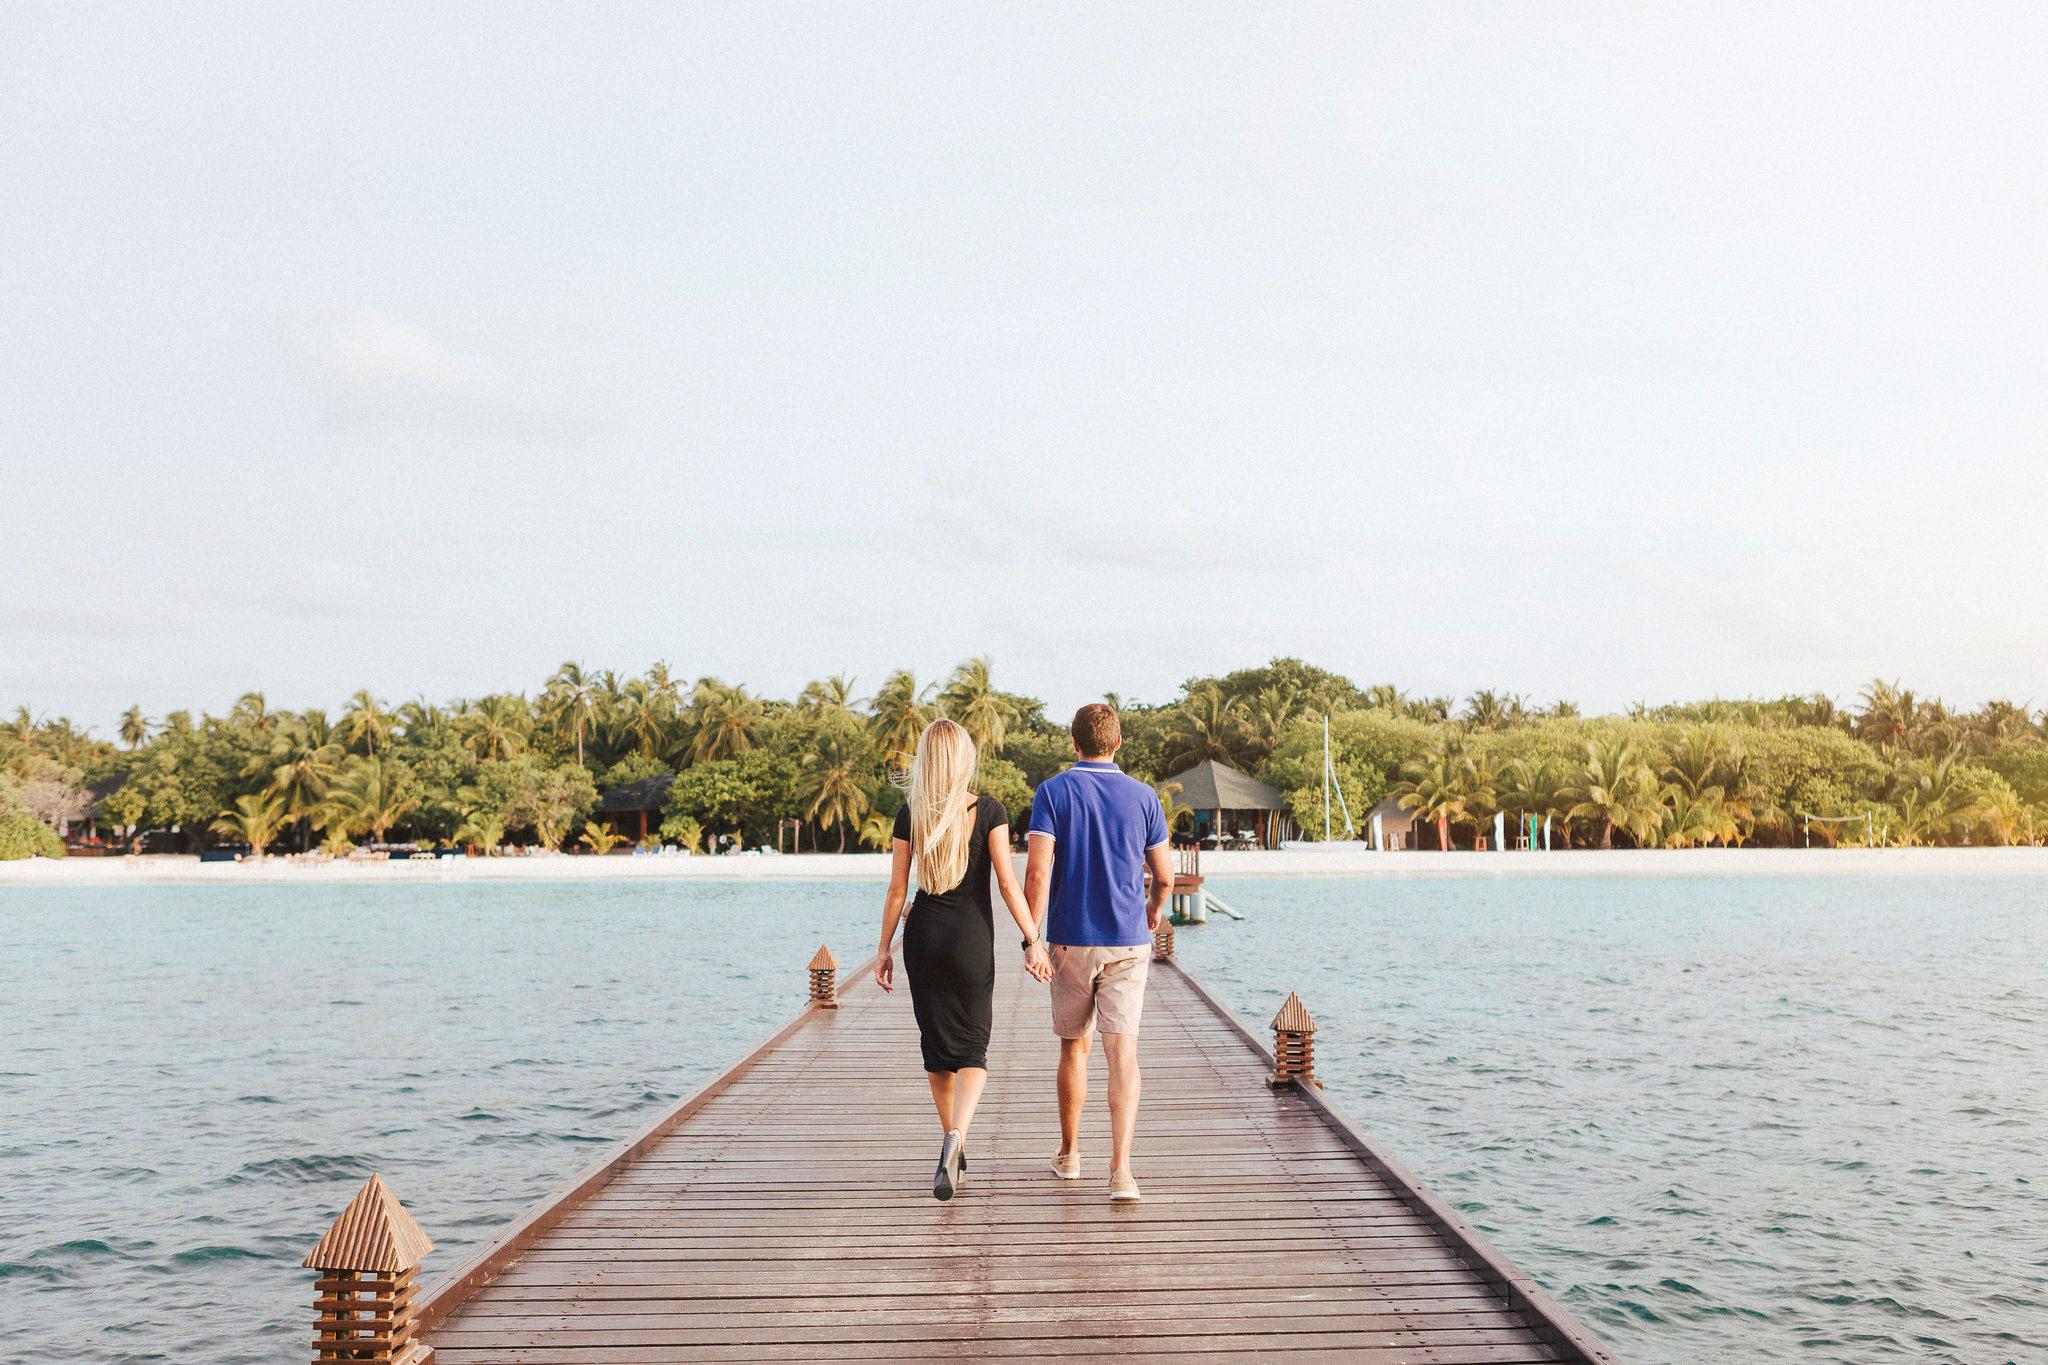 051-maldives-elopement-photographer.jpg